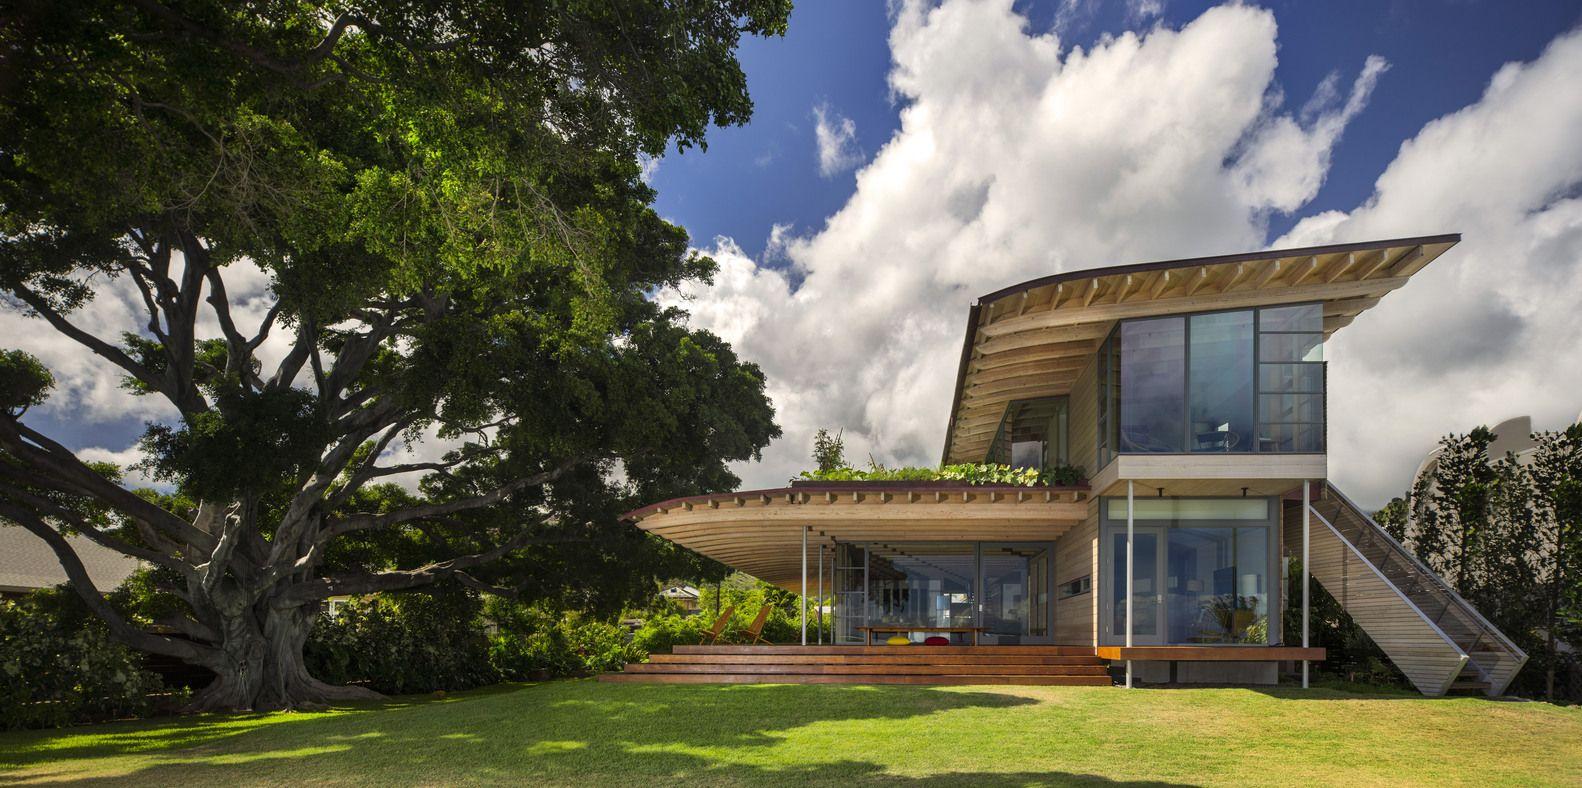 AIA Names 10 Best US Houses of 2016,Custom Housing: Island Residence; Honolulu / Bohlin Cywinski Jackson. Image Courtesy of AIA